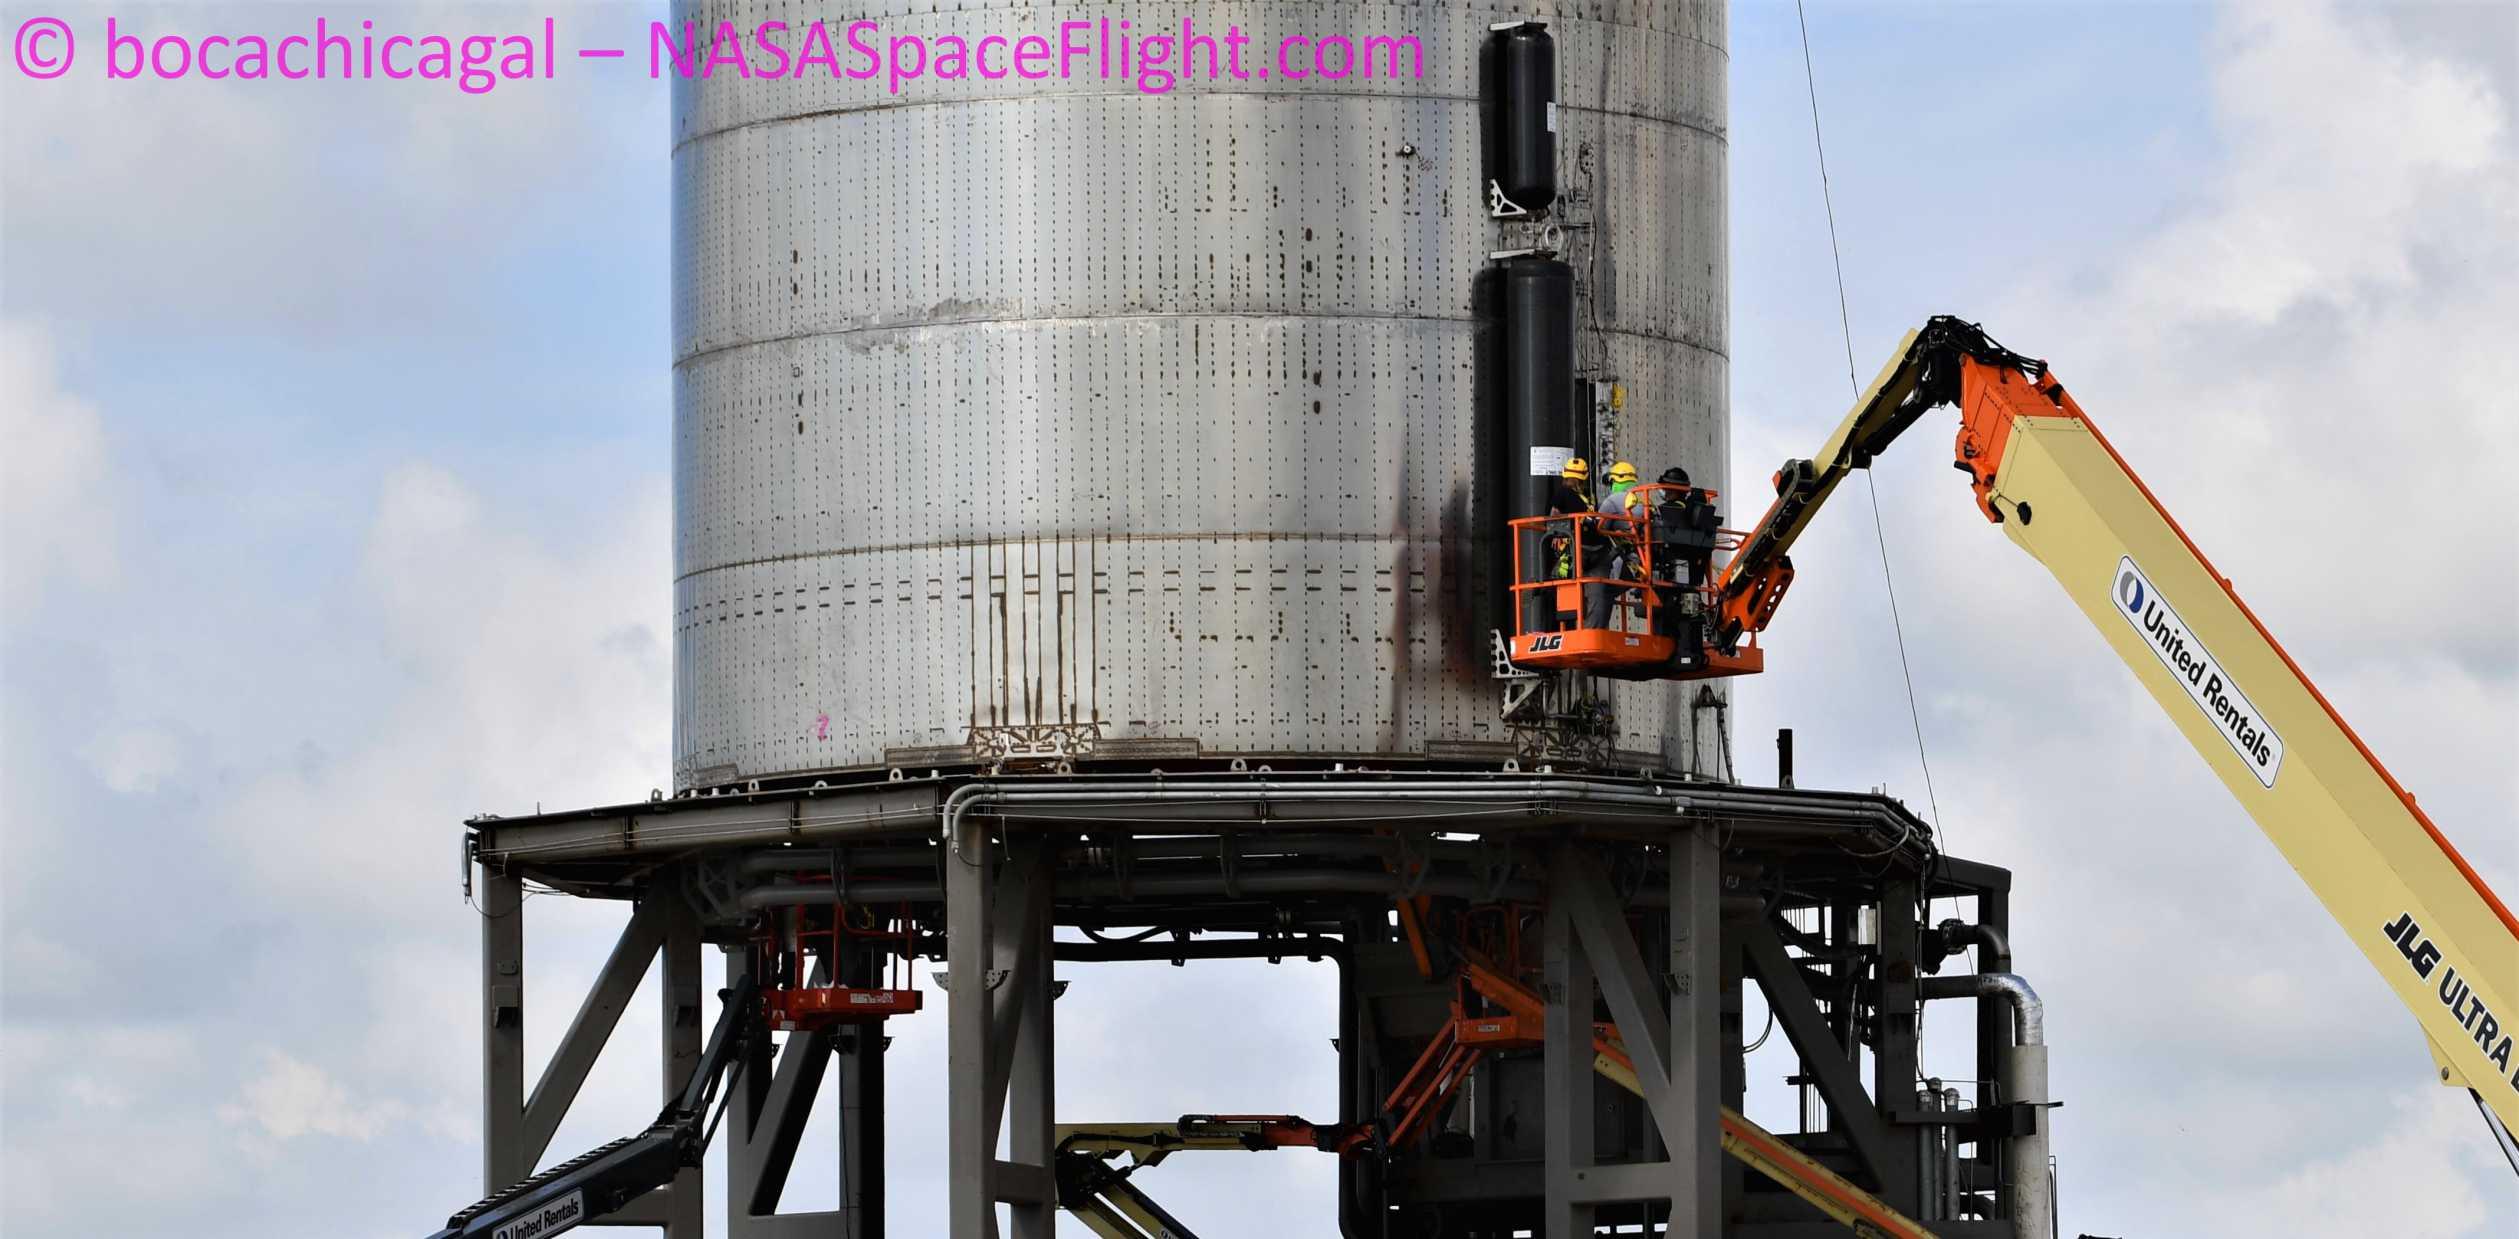 Starship Boca Chica 080120 (NASASpaceflight – bocachicagal) SN5 1 crop (c)